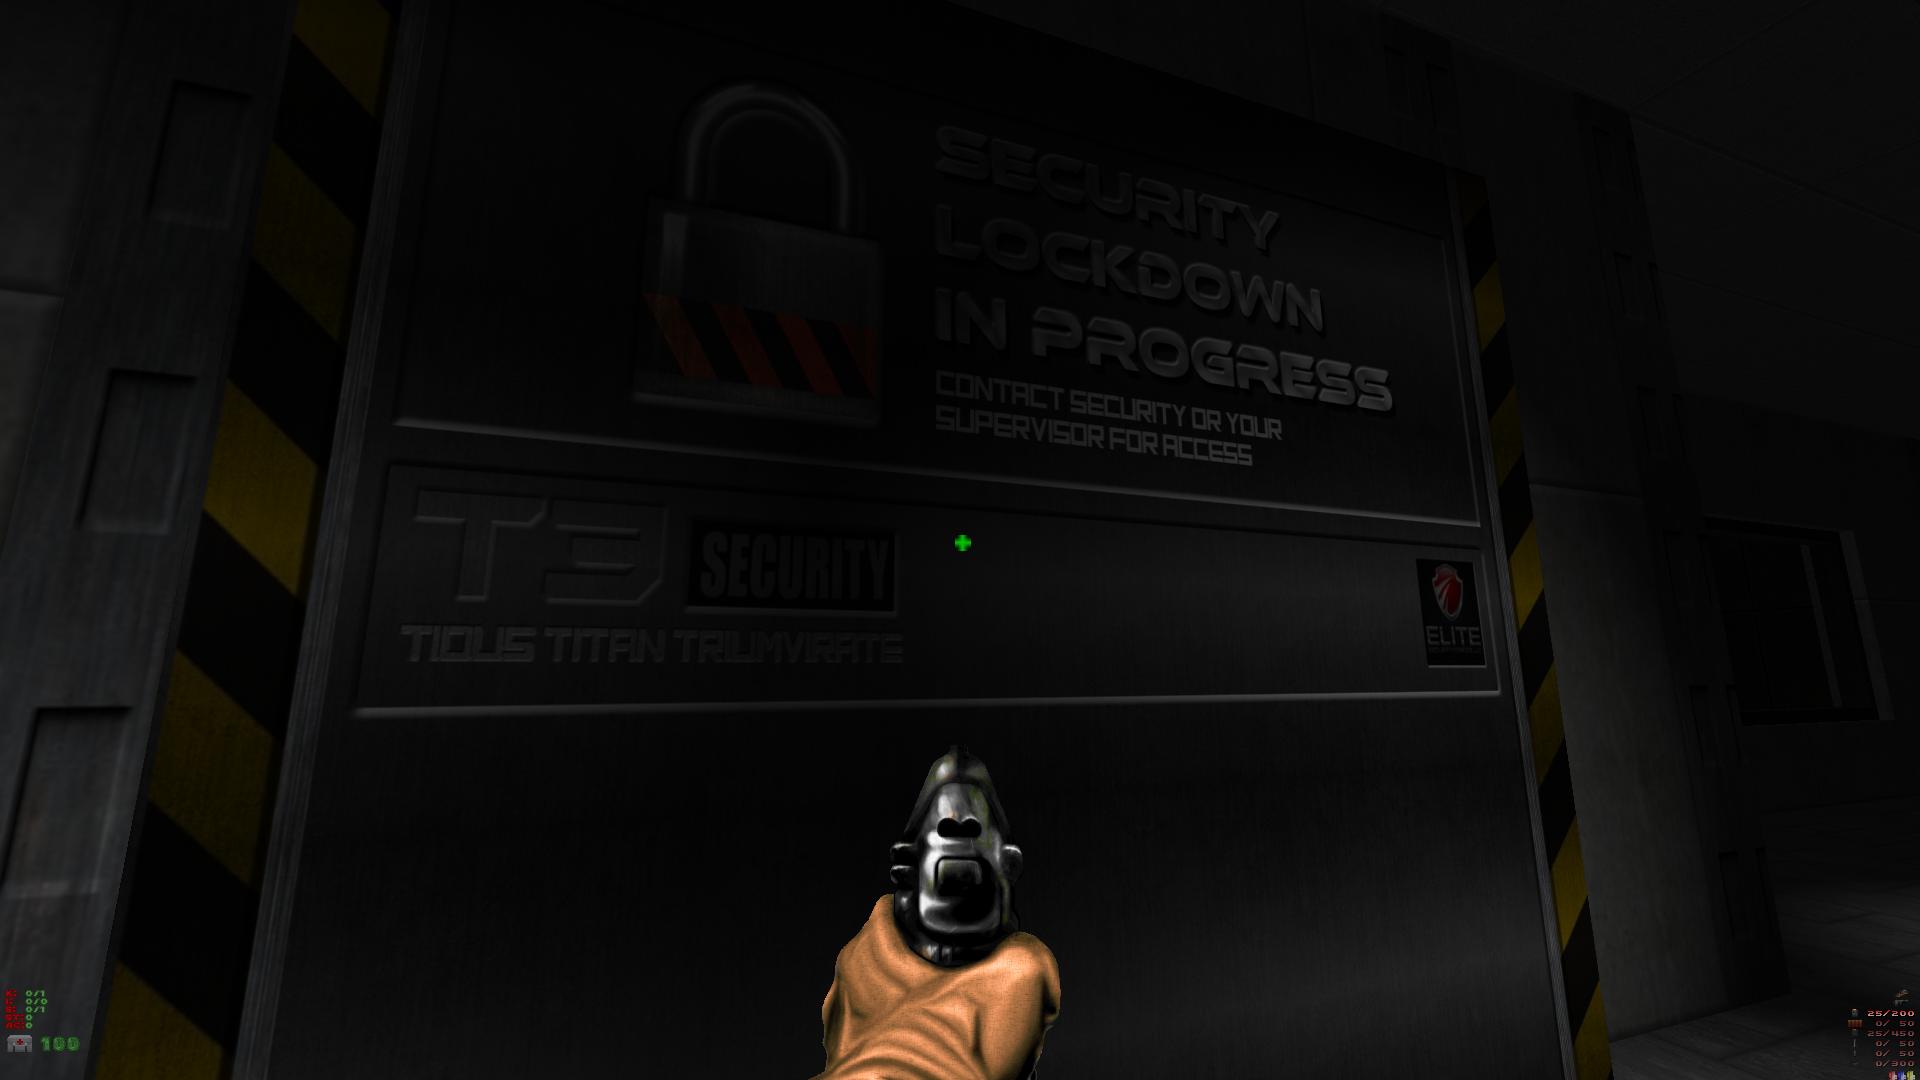 Screenshot_Doom_20190219_025614.png.d811b8d6f23a67ef86b88672a78caccf.png